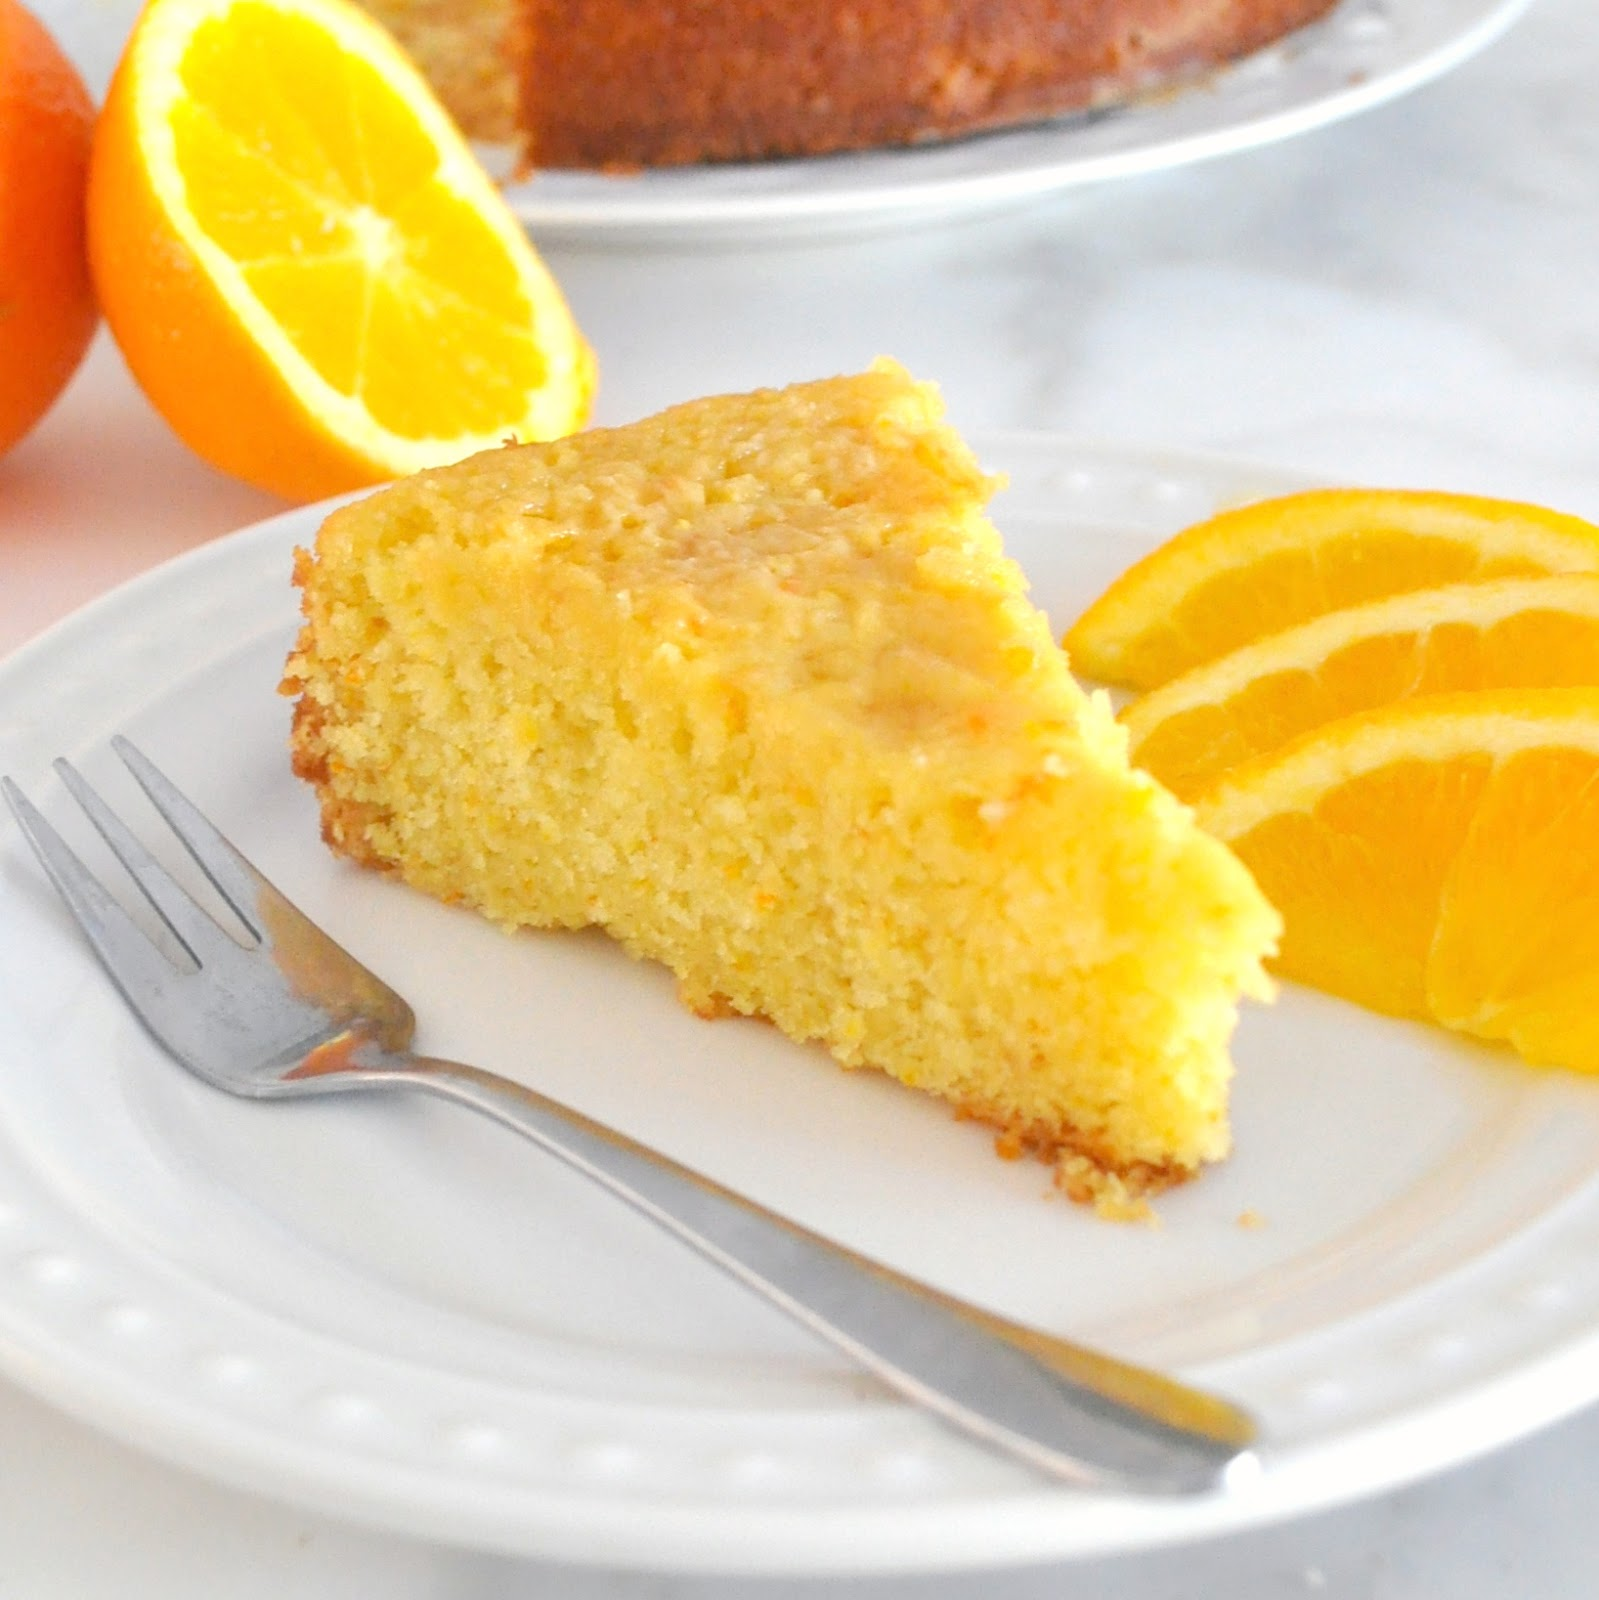 Homemade orange juice cake recipe